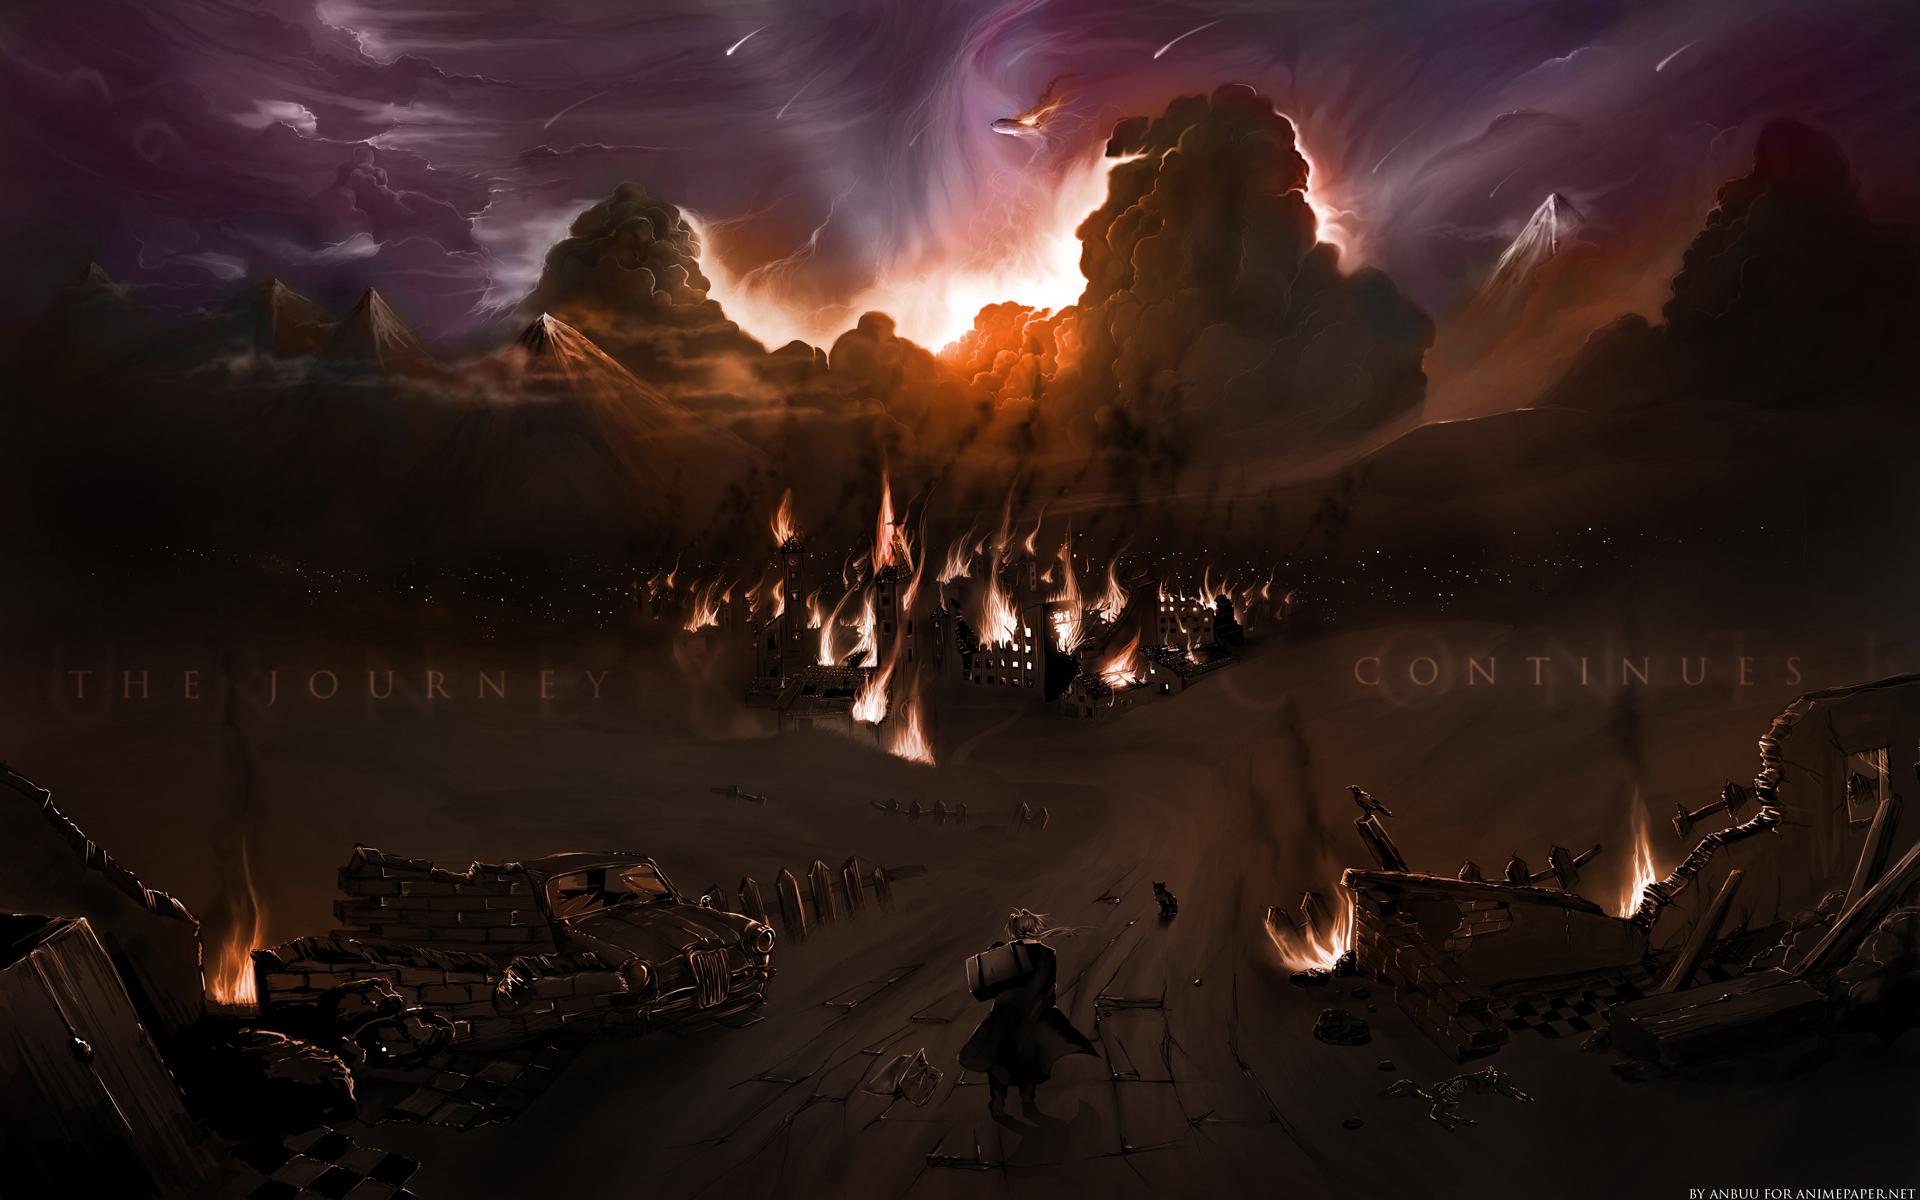 fullmetal alchemist full hd wallpaper and background image